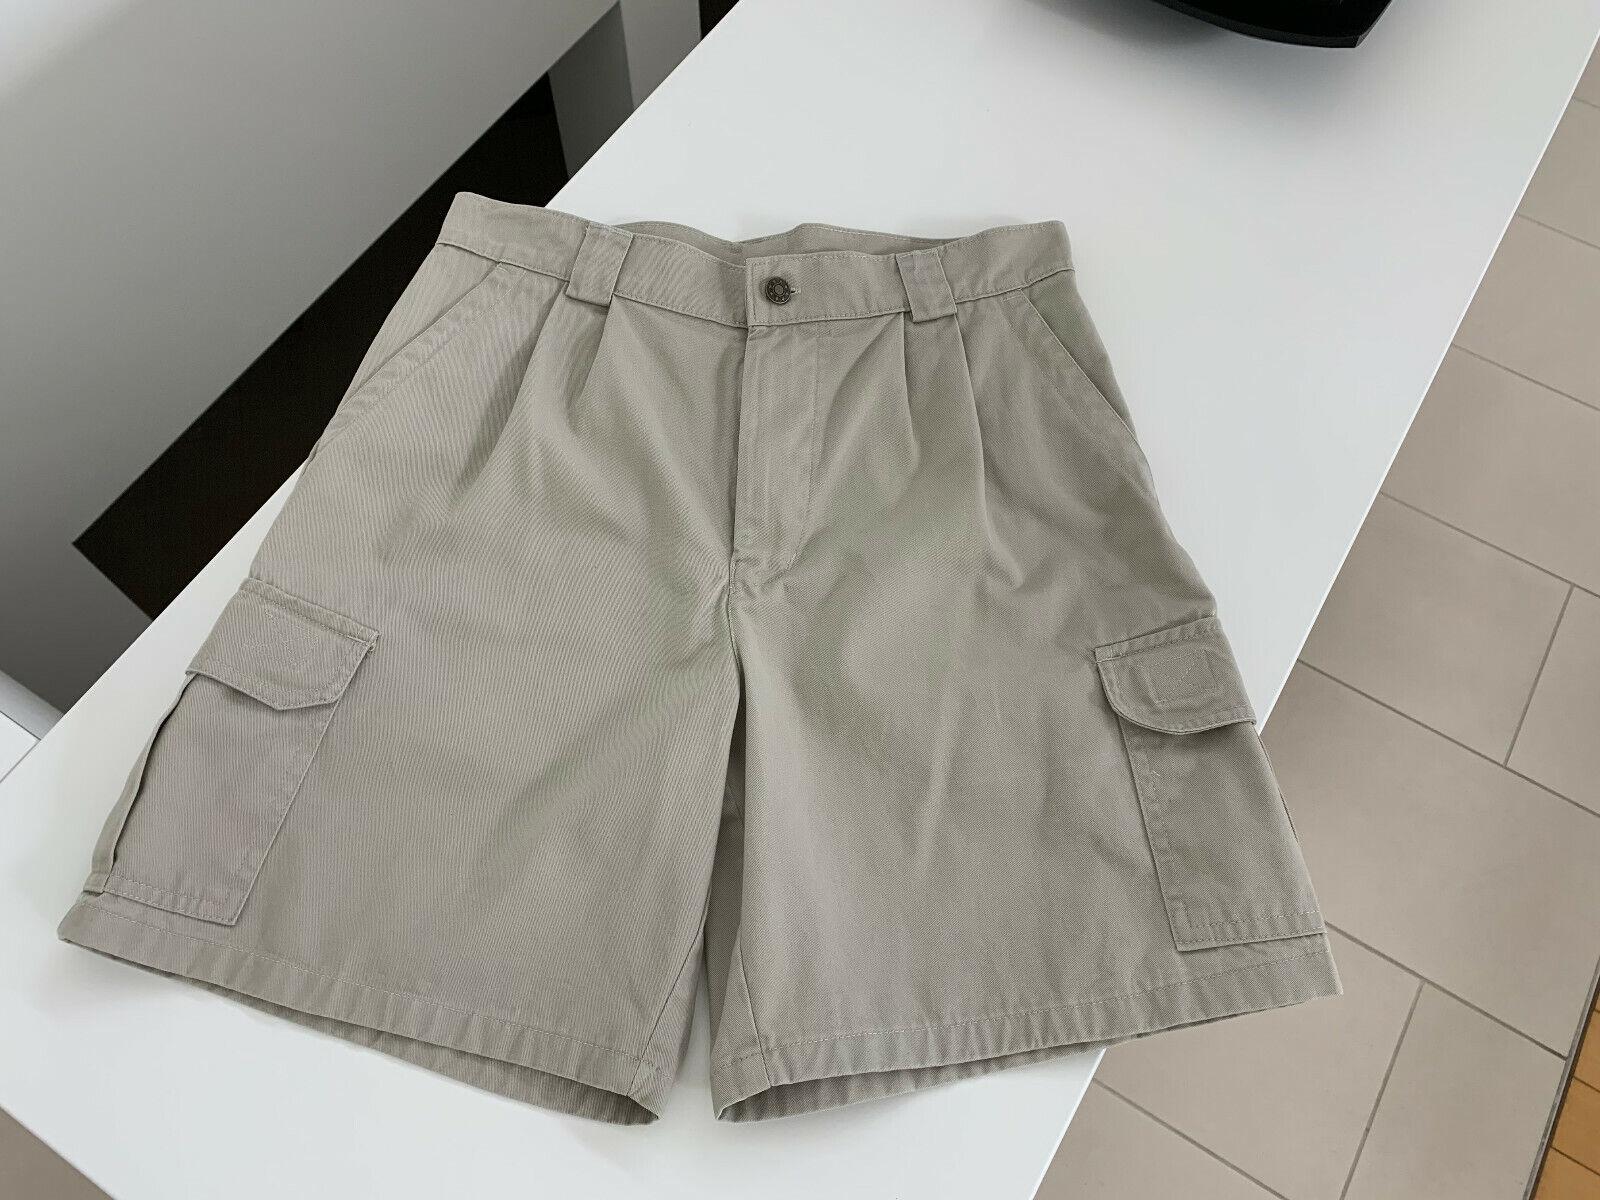 4EVER Wear Damen Safari Wander Bermuda Gr. 32/81 Beige 100% Cotton NEU